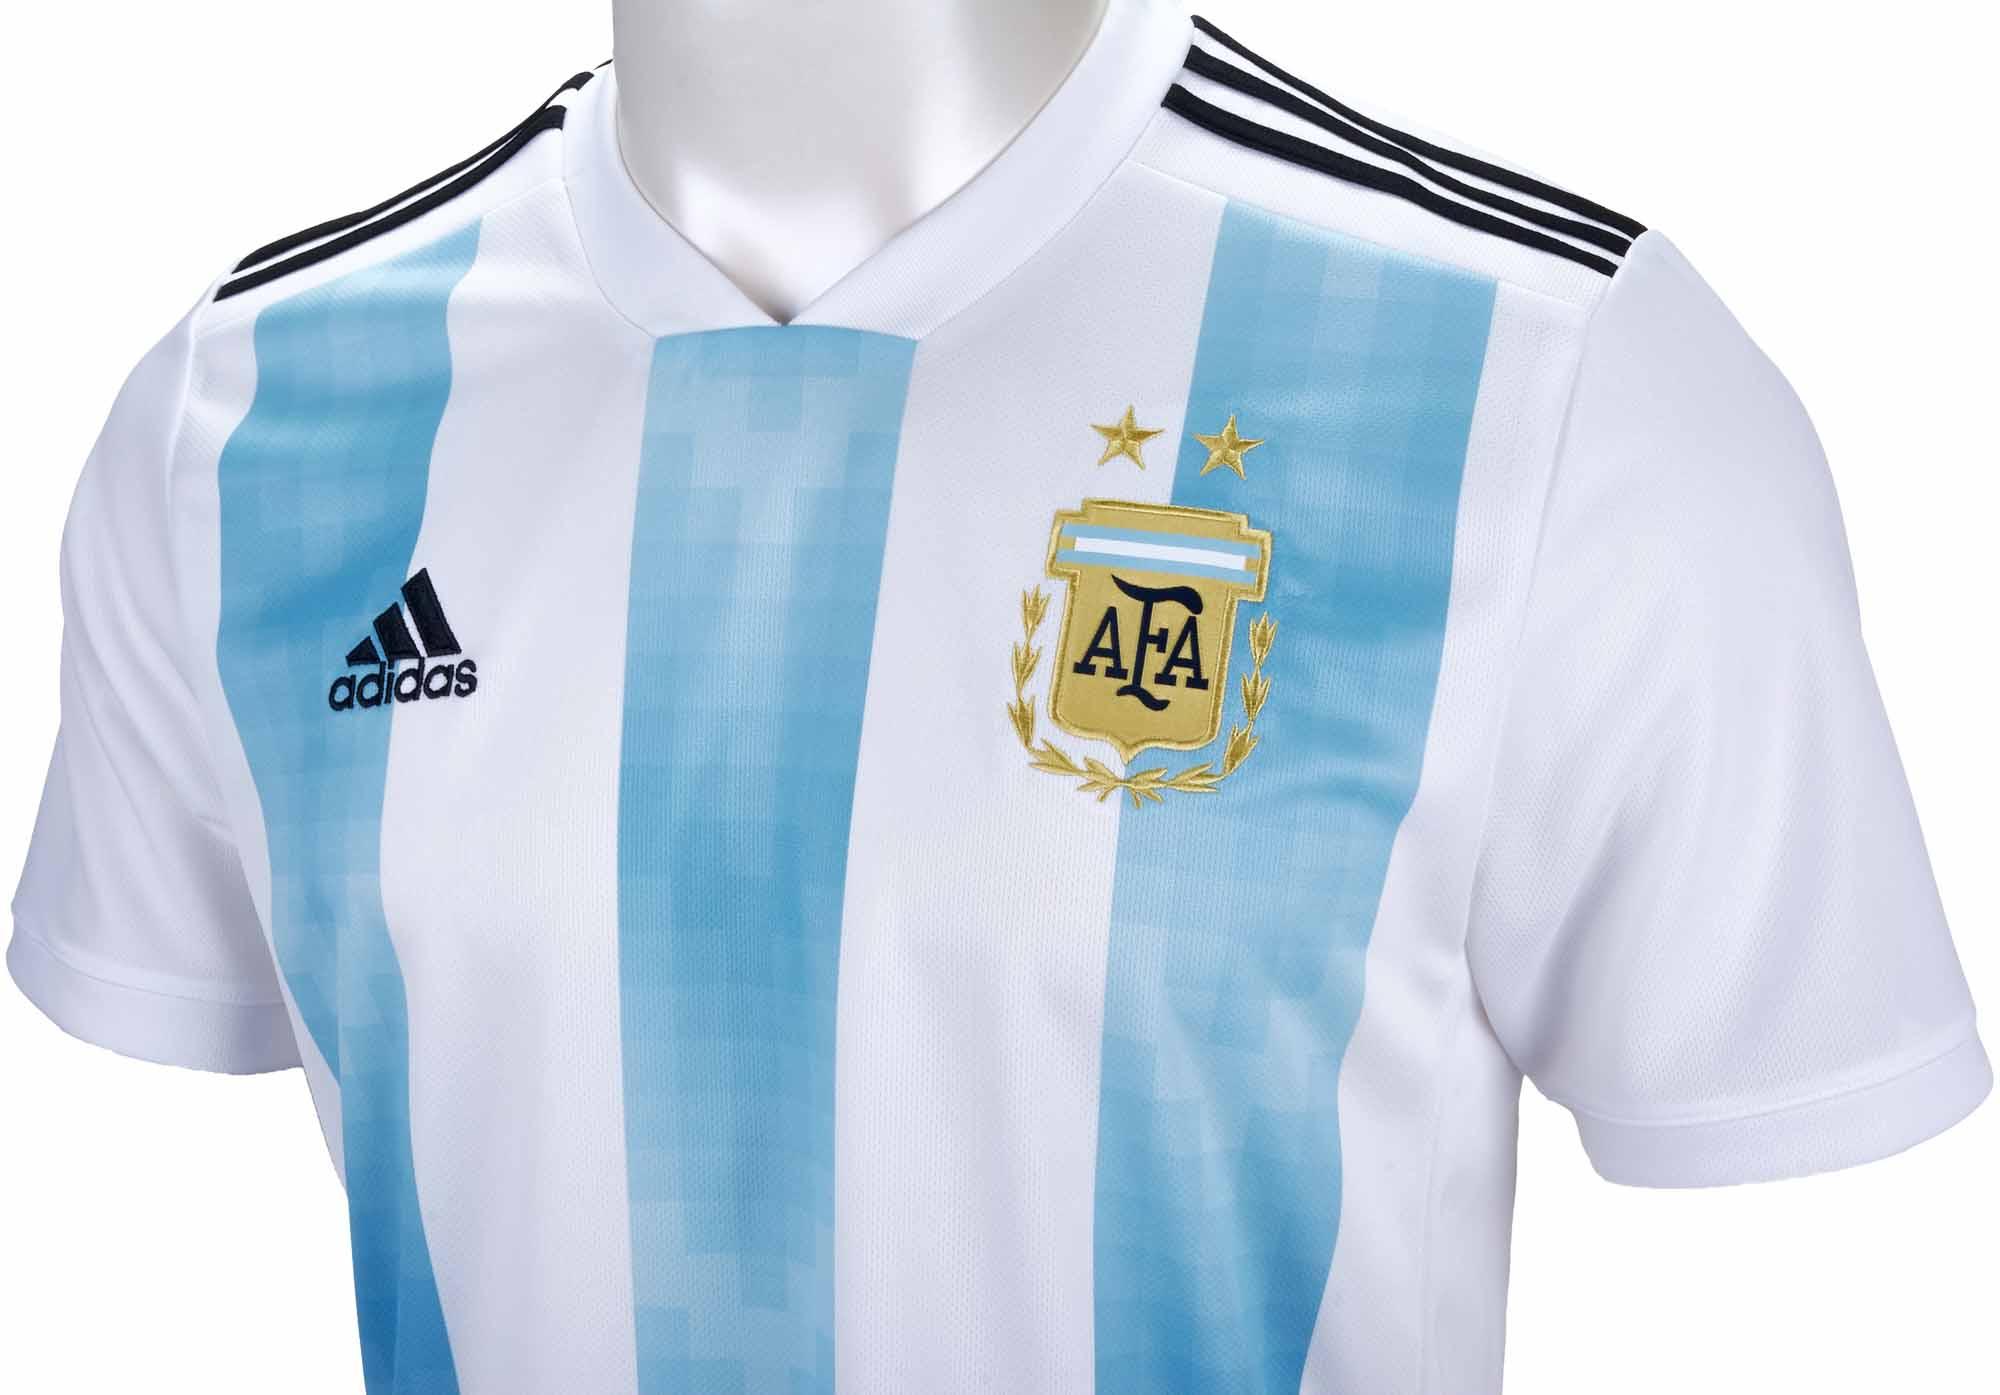 39388686d adidas Argentina Home Jersey 2018-19 - SoccerPro.com